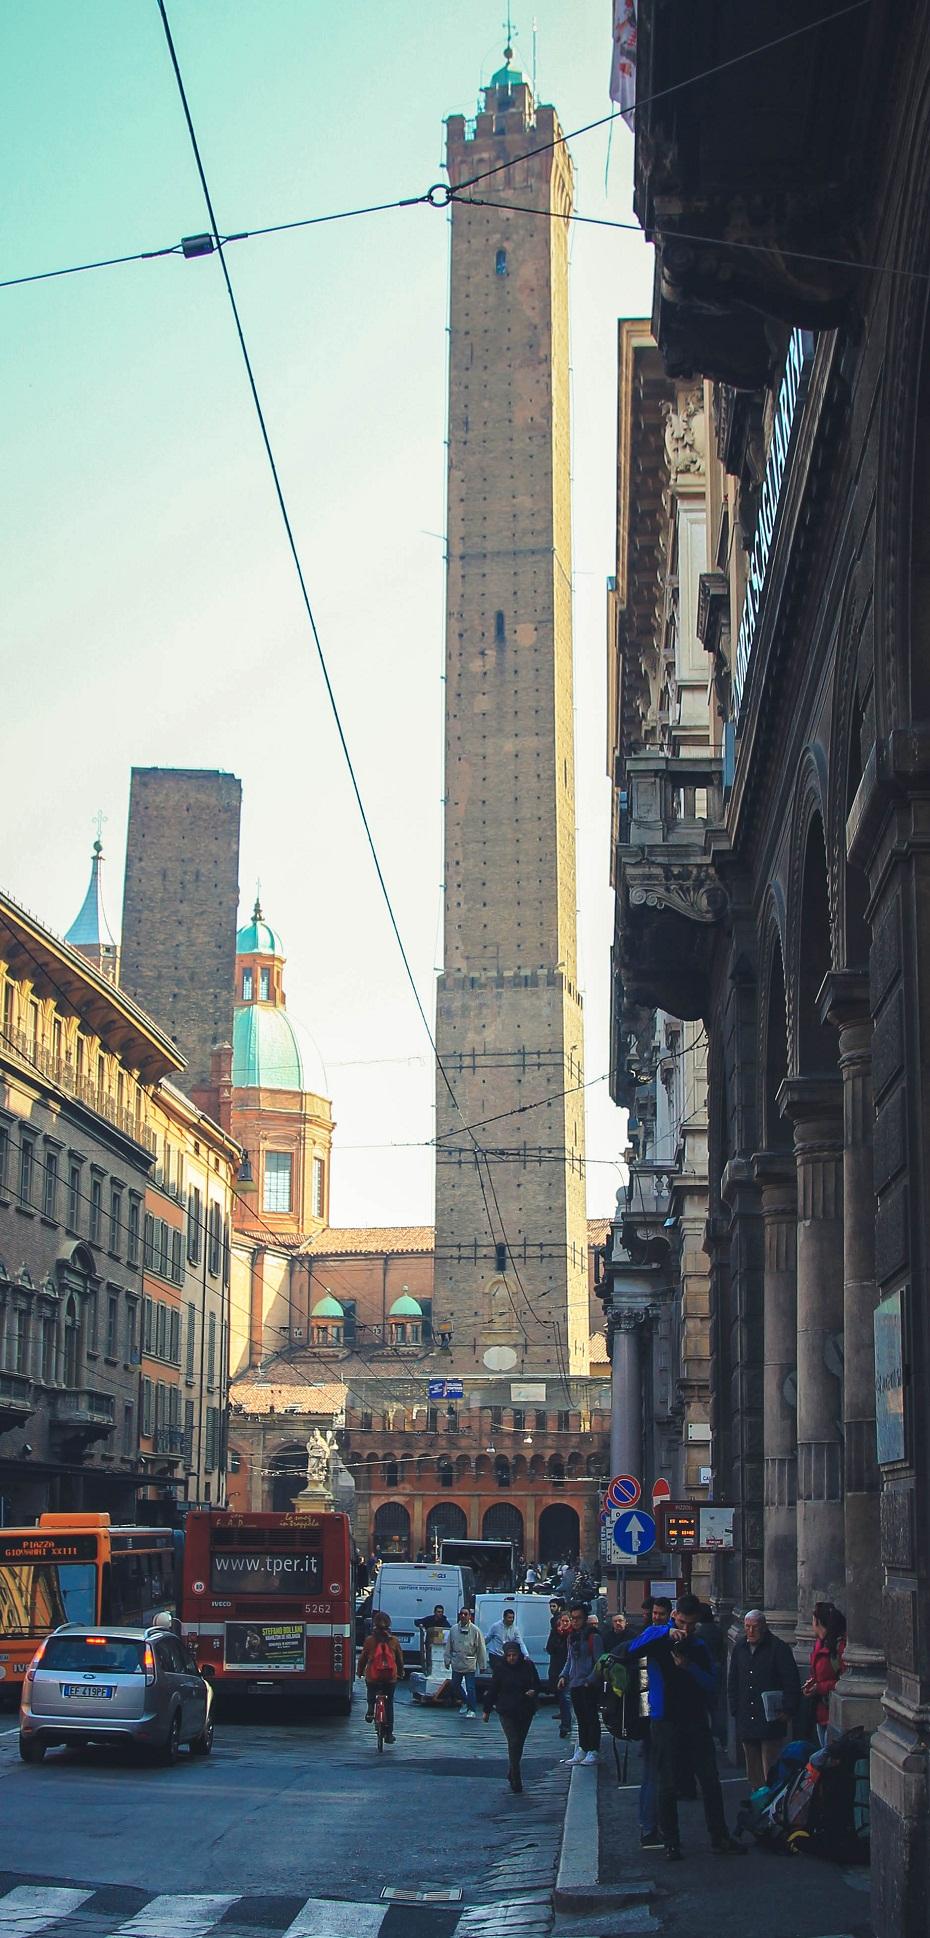 Wieża Asinelli Tower